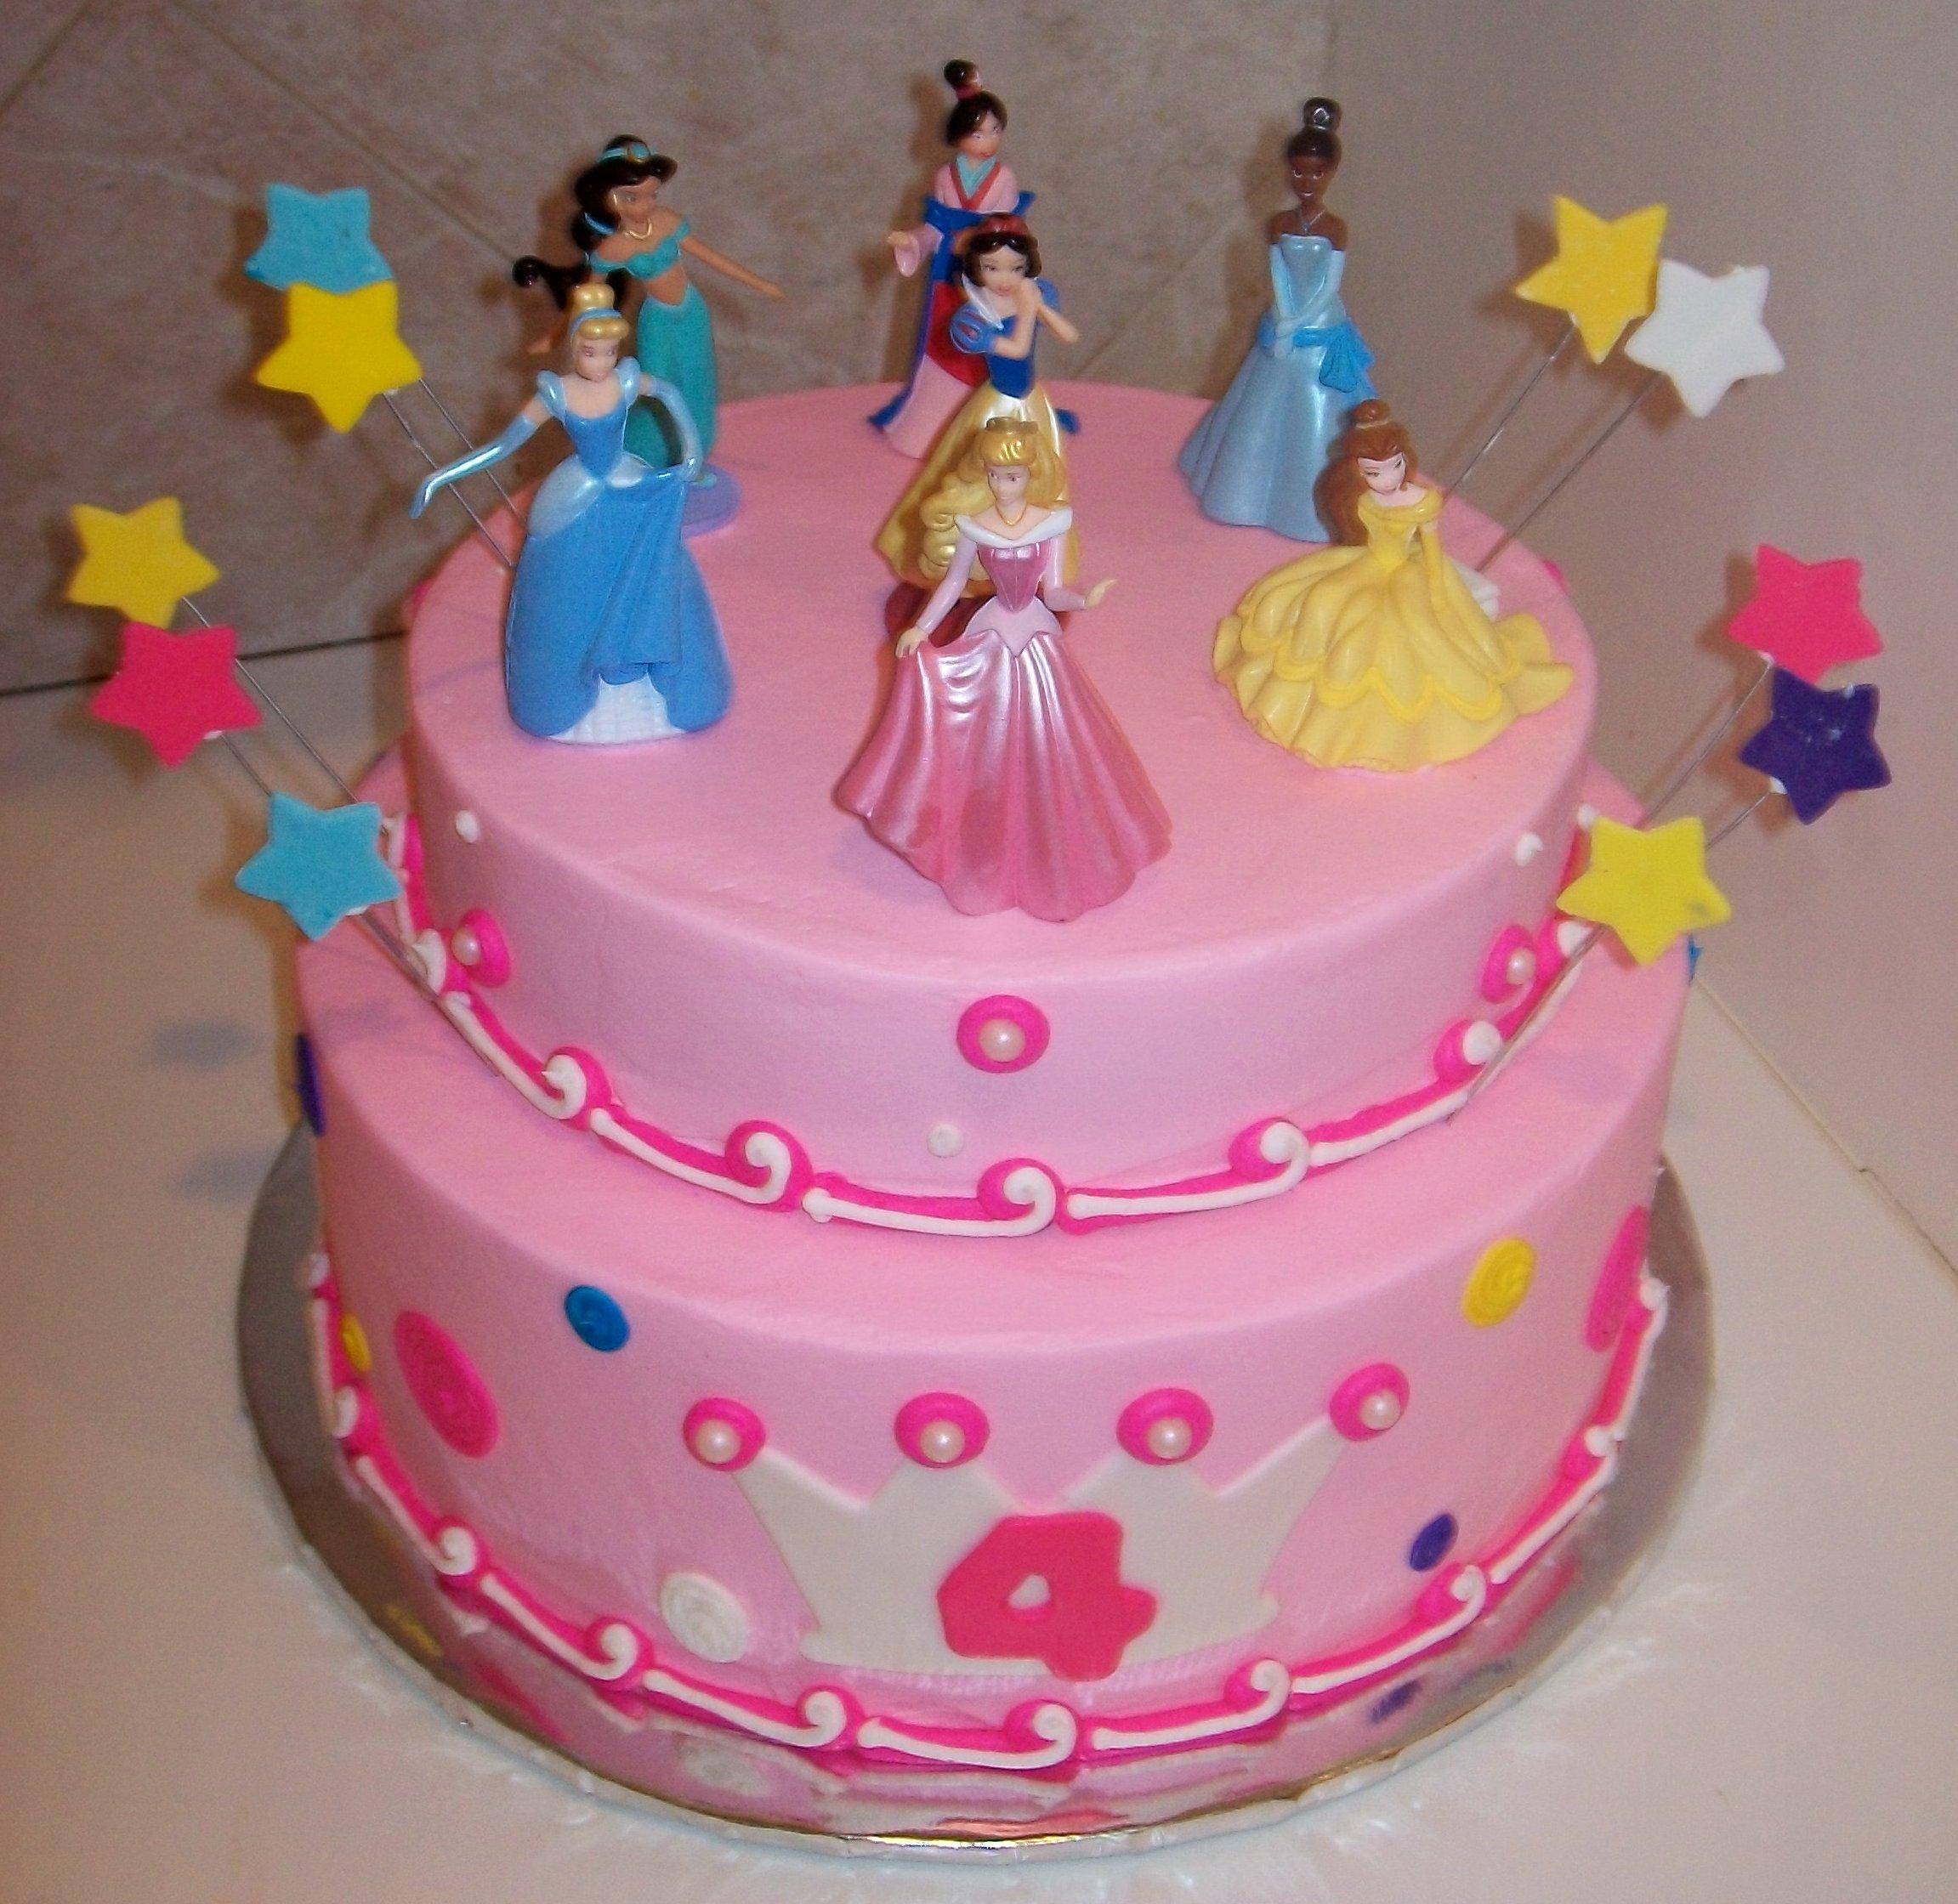 Pride ad cakes 017